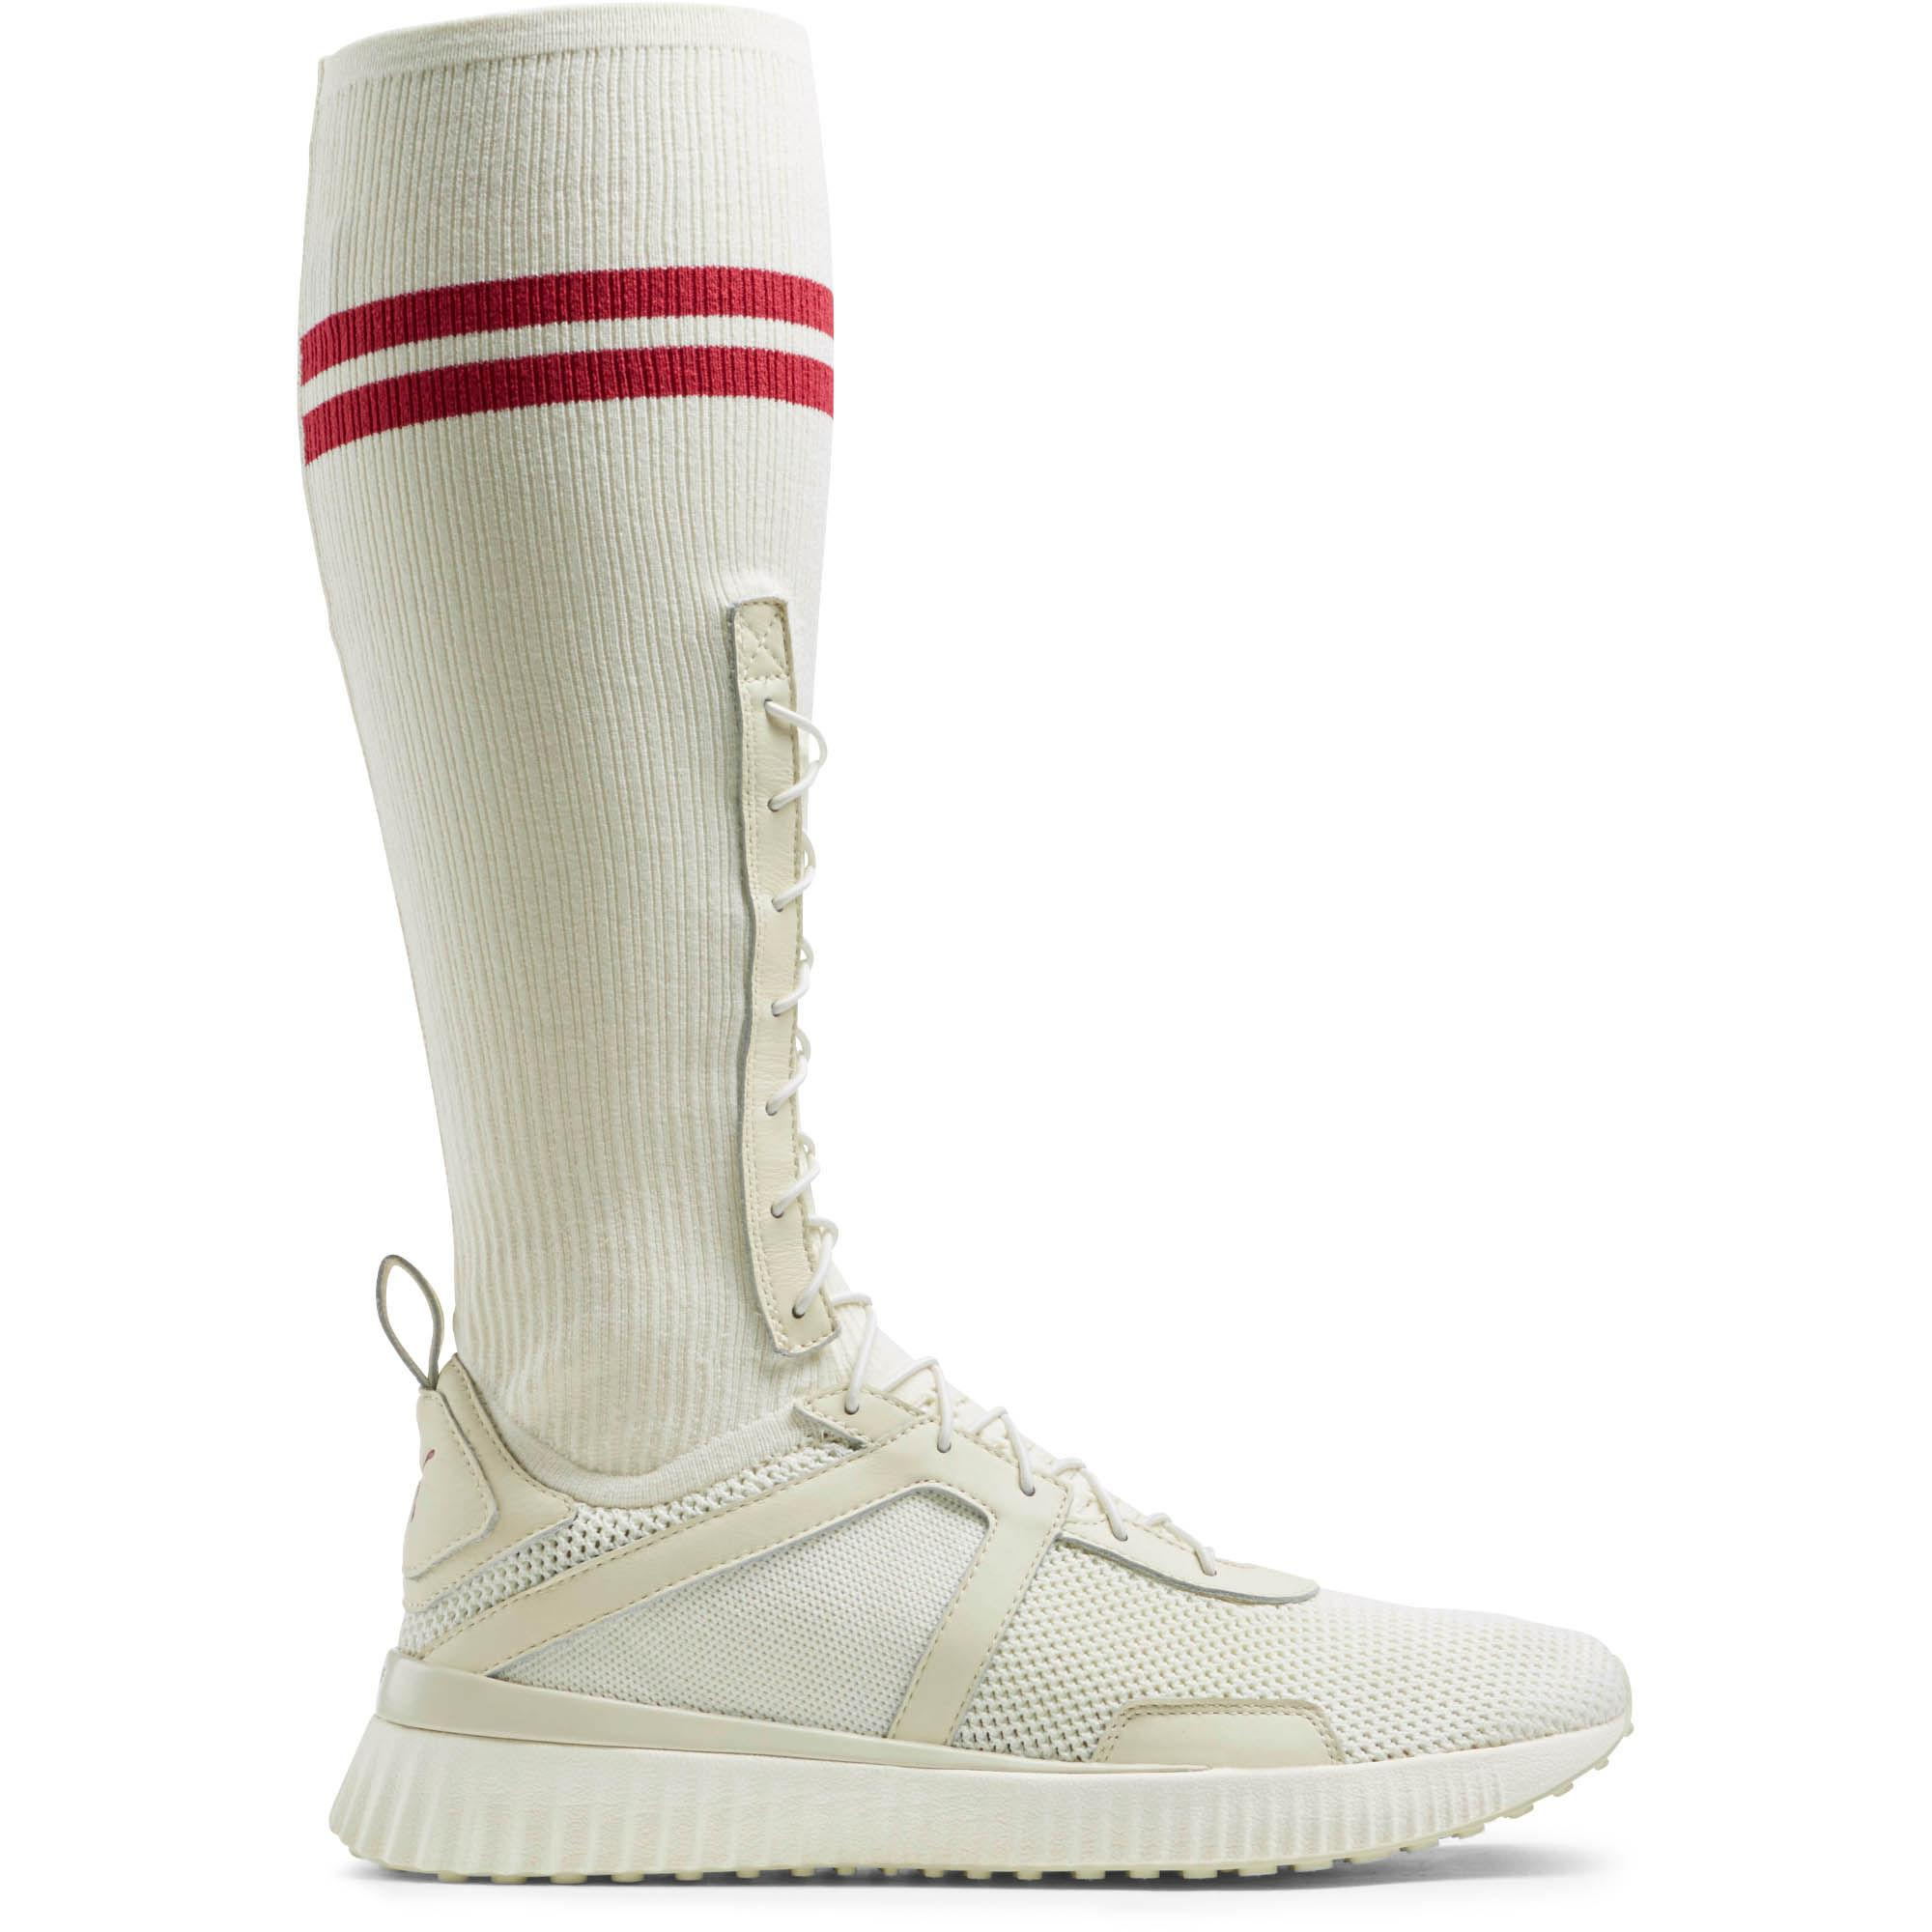 free shipping d9945 b01b4 PUMA Multicolor Fenty Trainer Hi Men's Sneakers for men